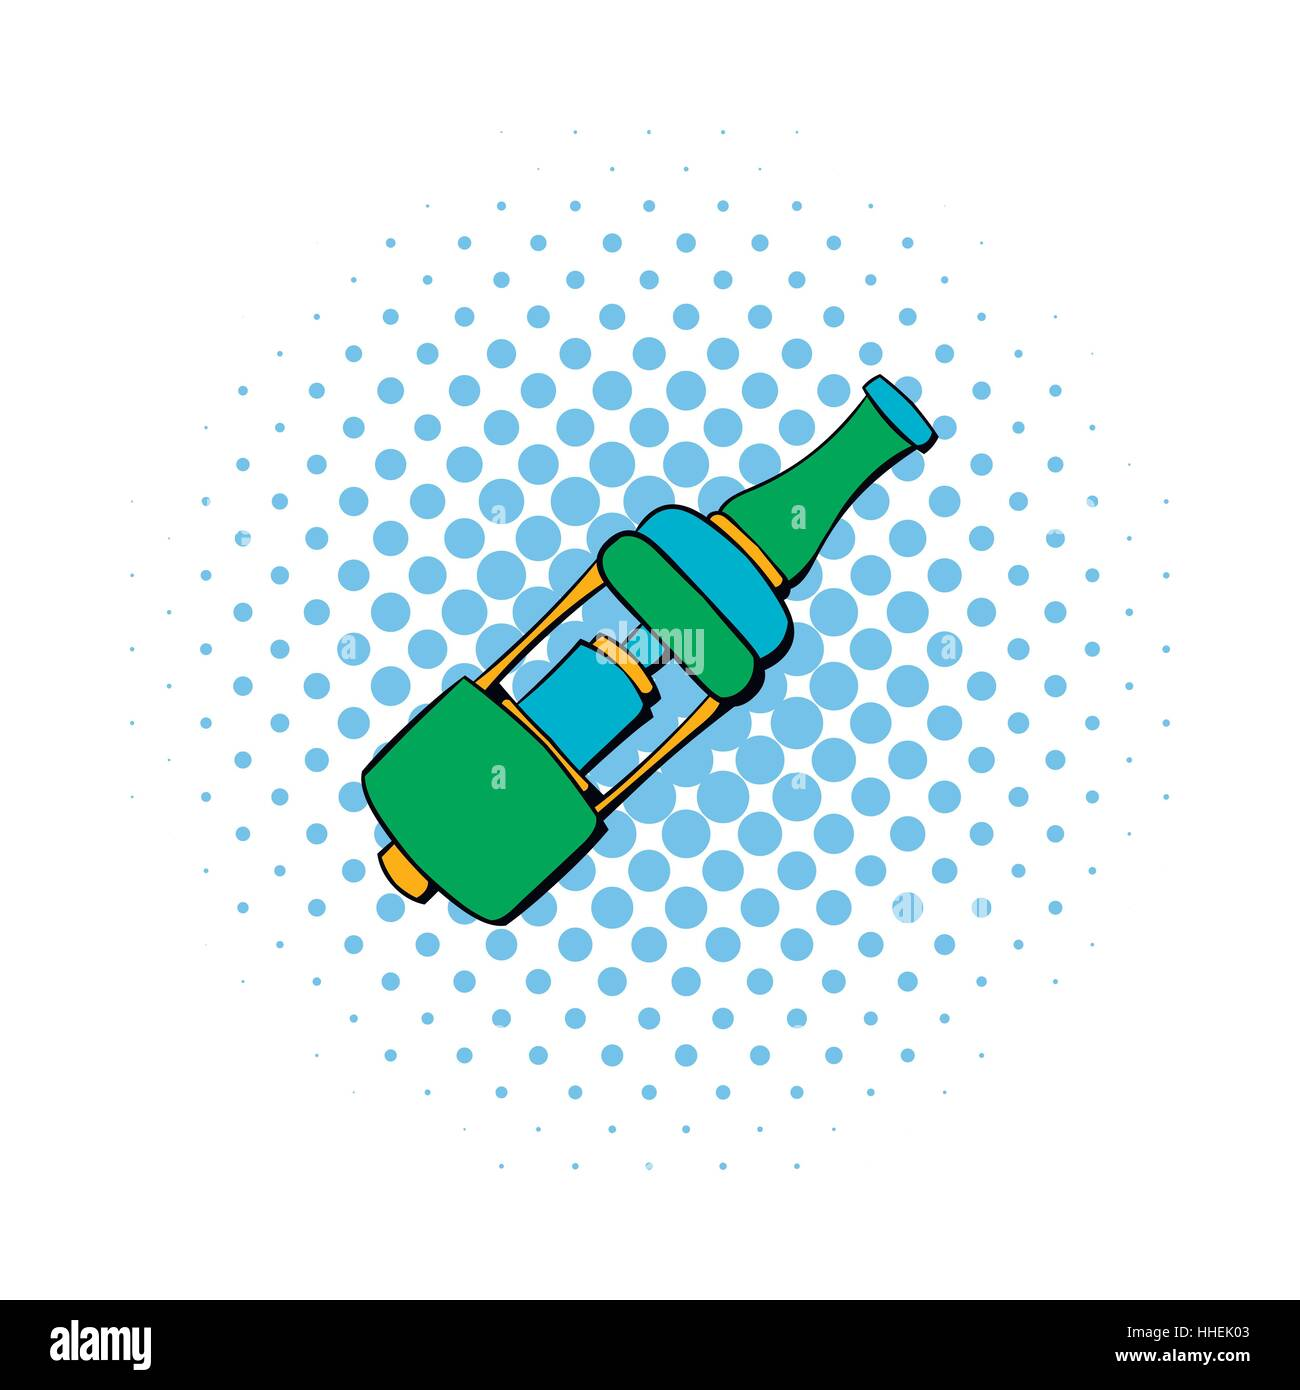 Electronic cigarette mouthpiece icon, comics style - Stock Image